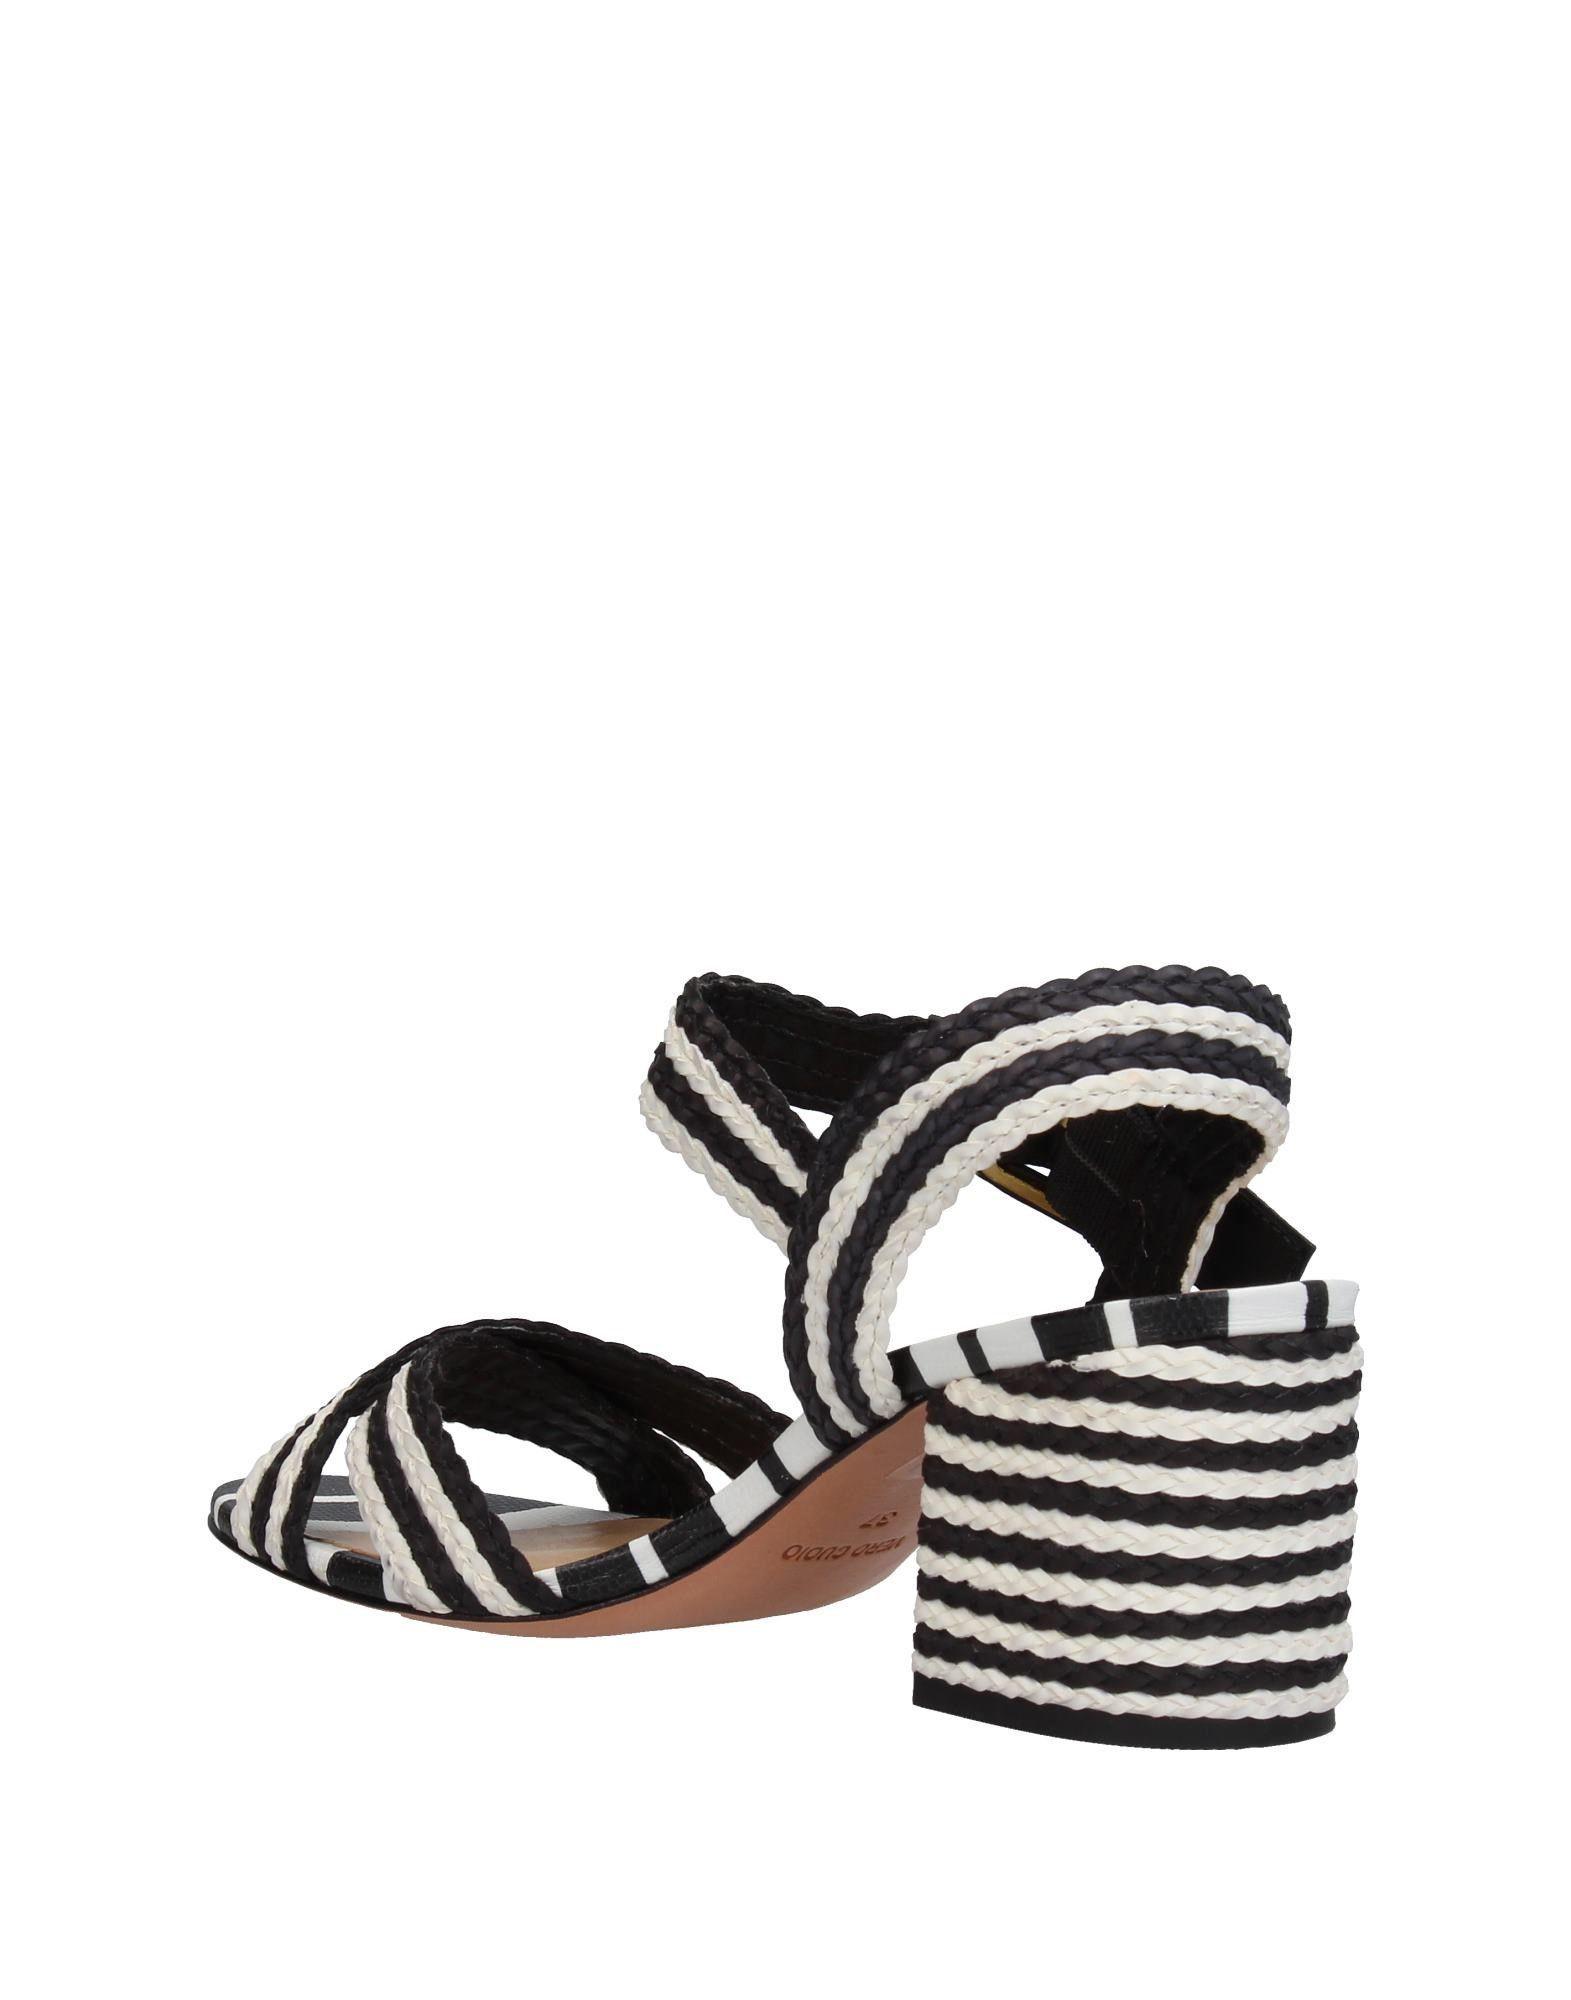 La Perla Black Stripe Heeled Sandals